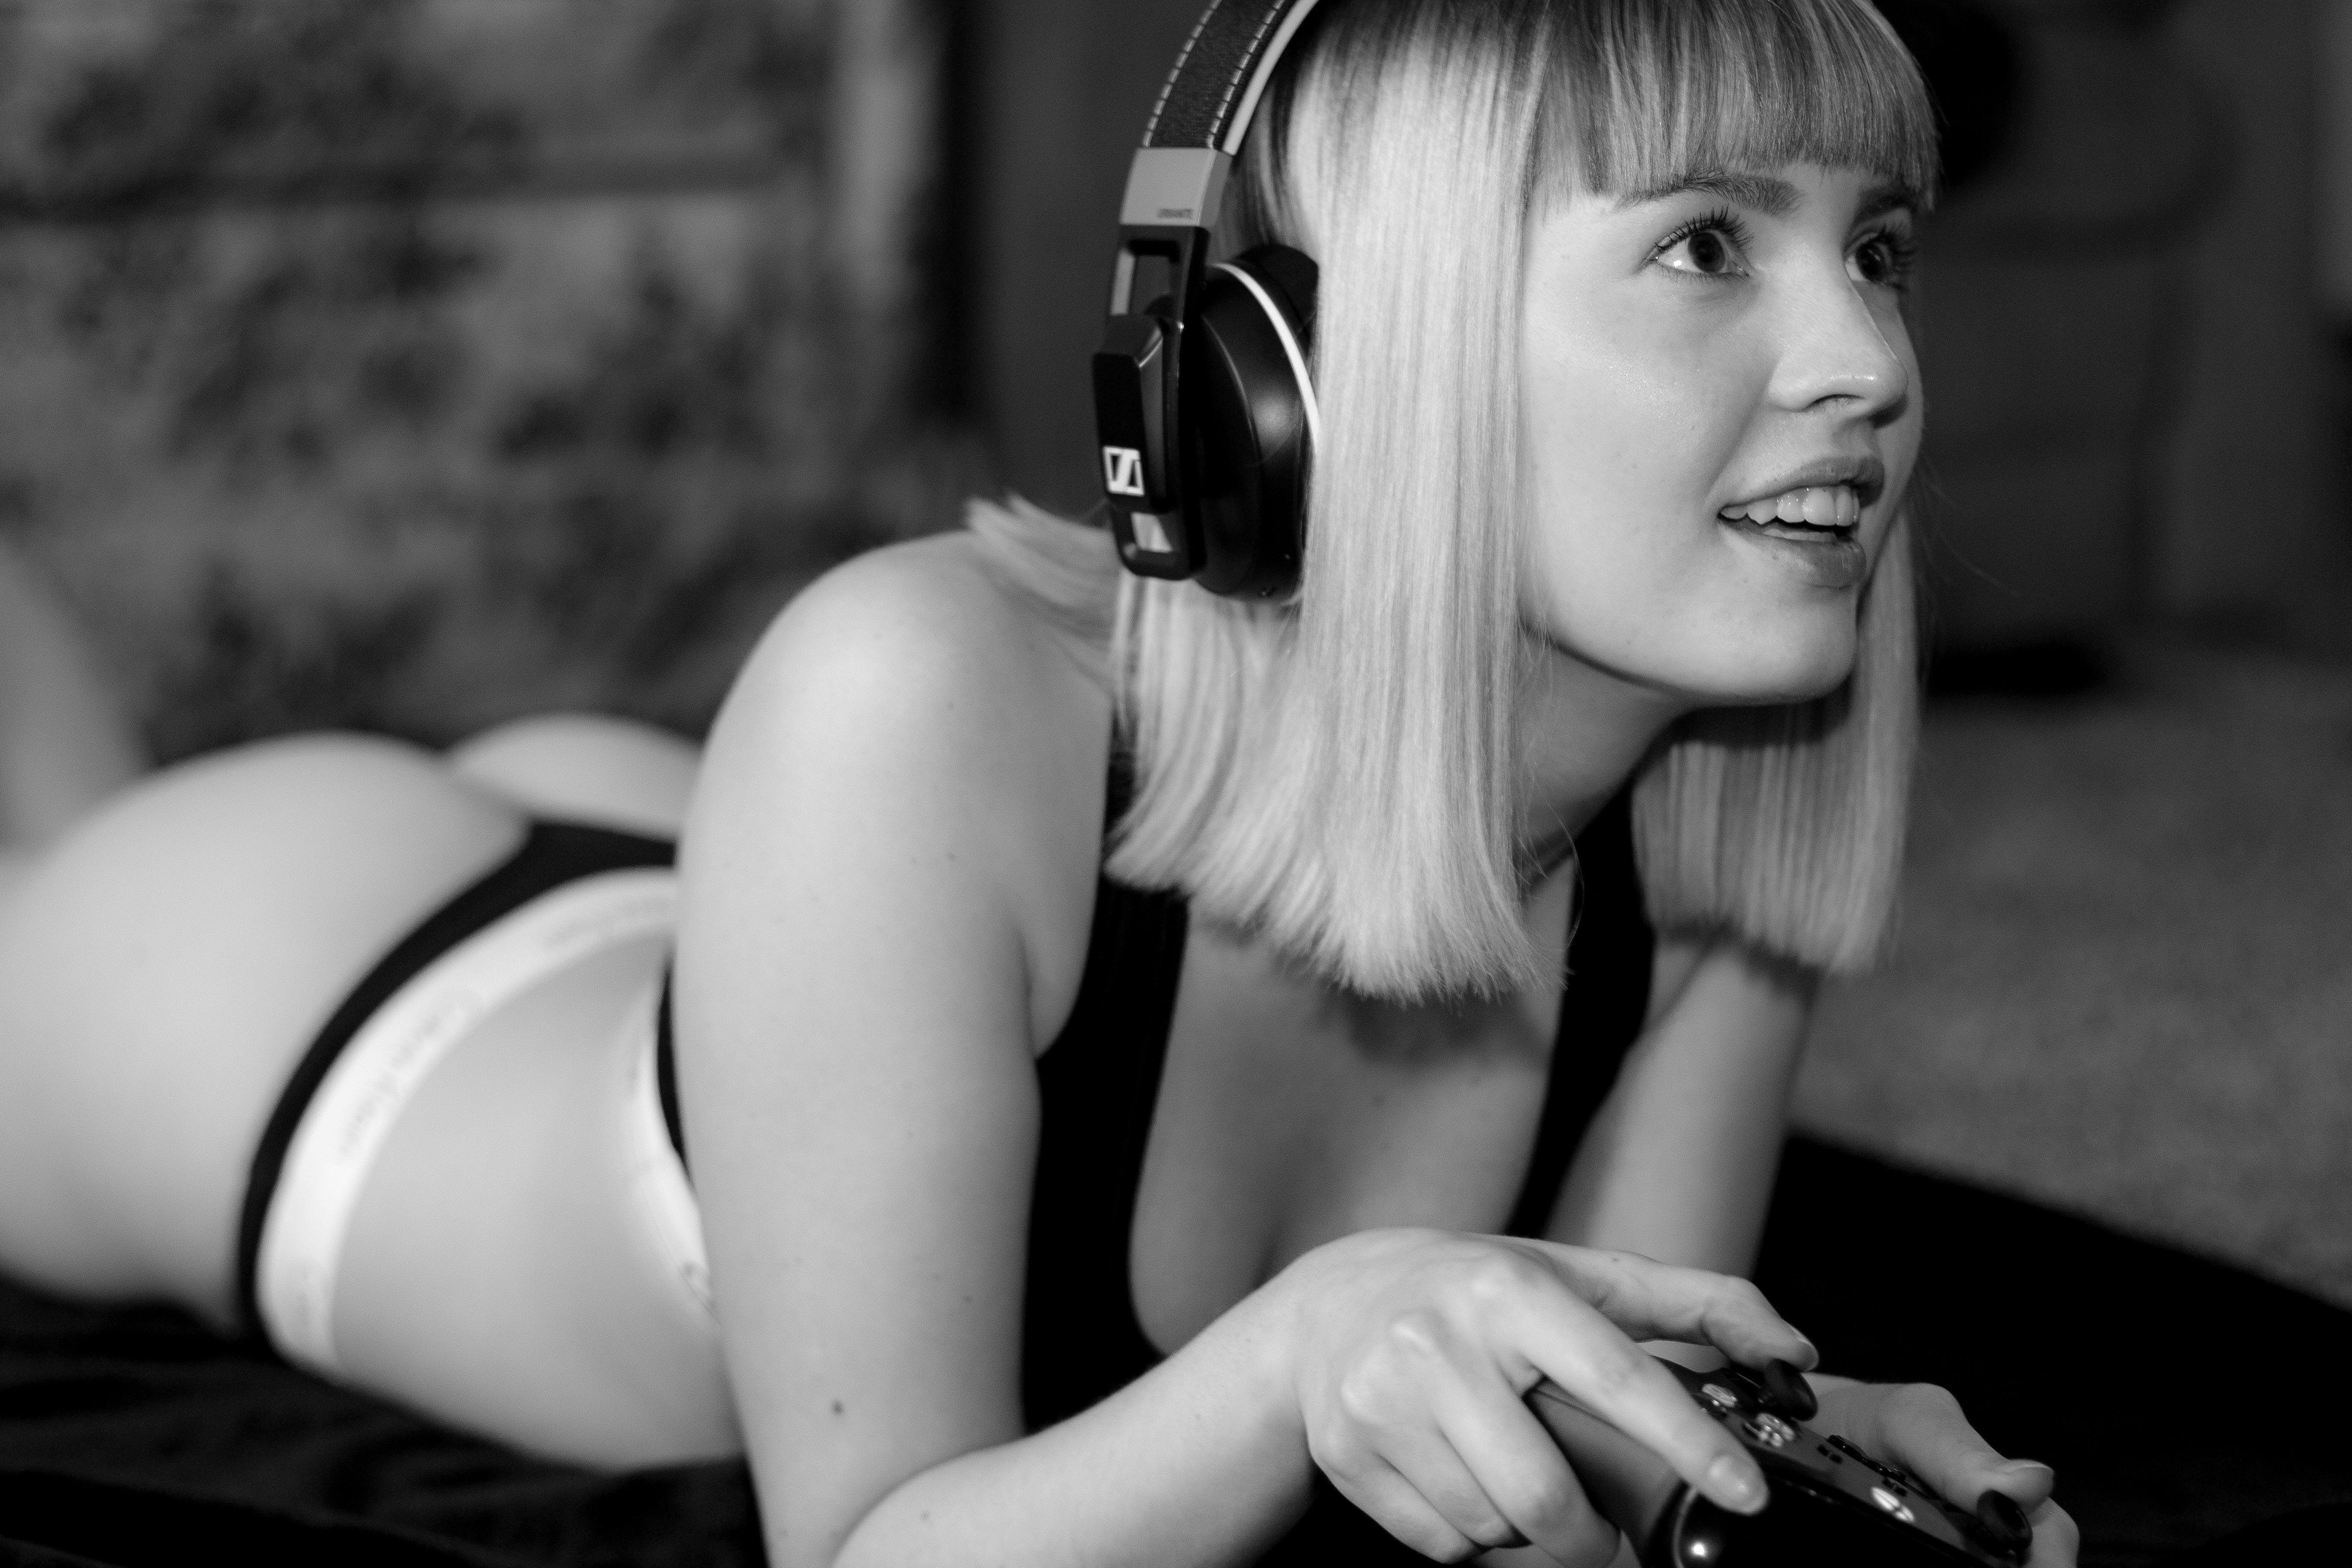 Sexy white girls porn free downloads 1